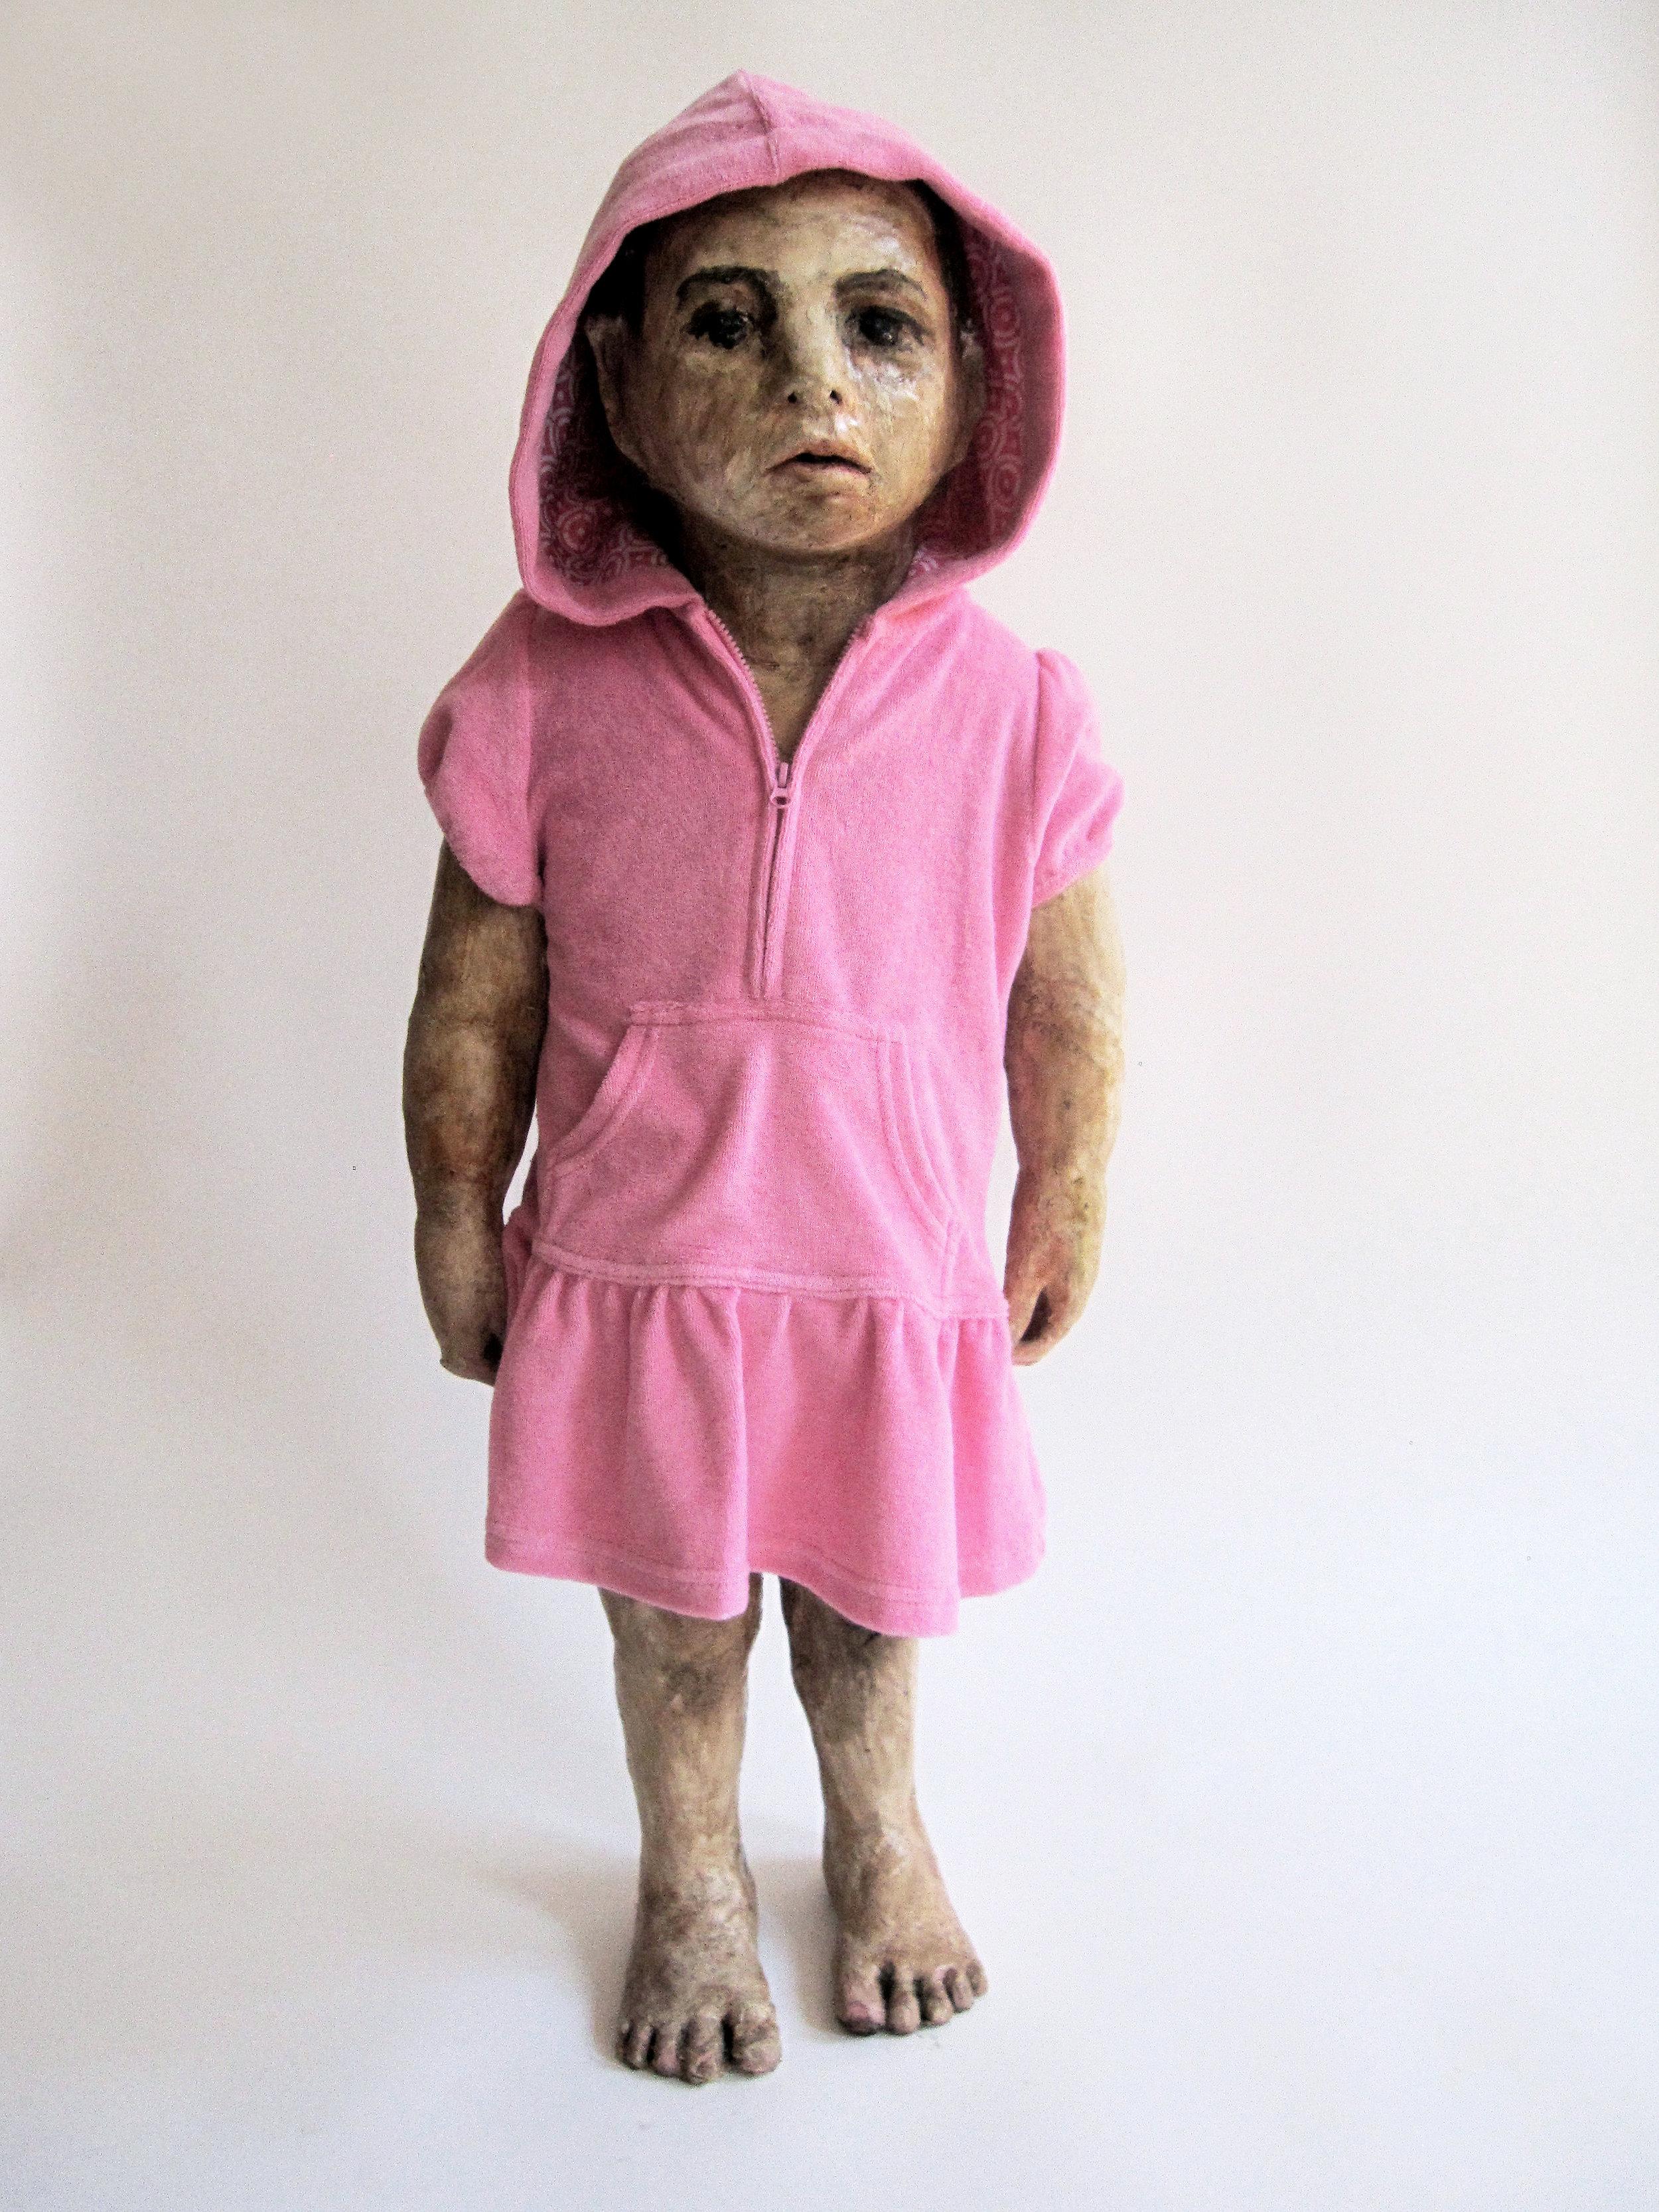 Kid with Hoody, 2012, Fabric on glazed ceramic, 34 1/2 x 15 x 11 in.